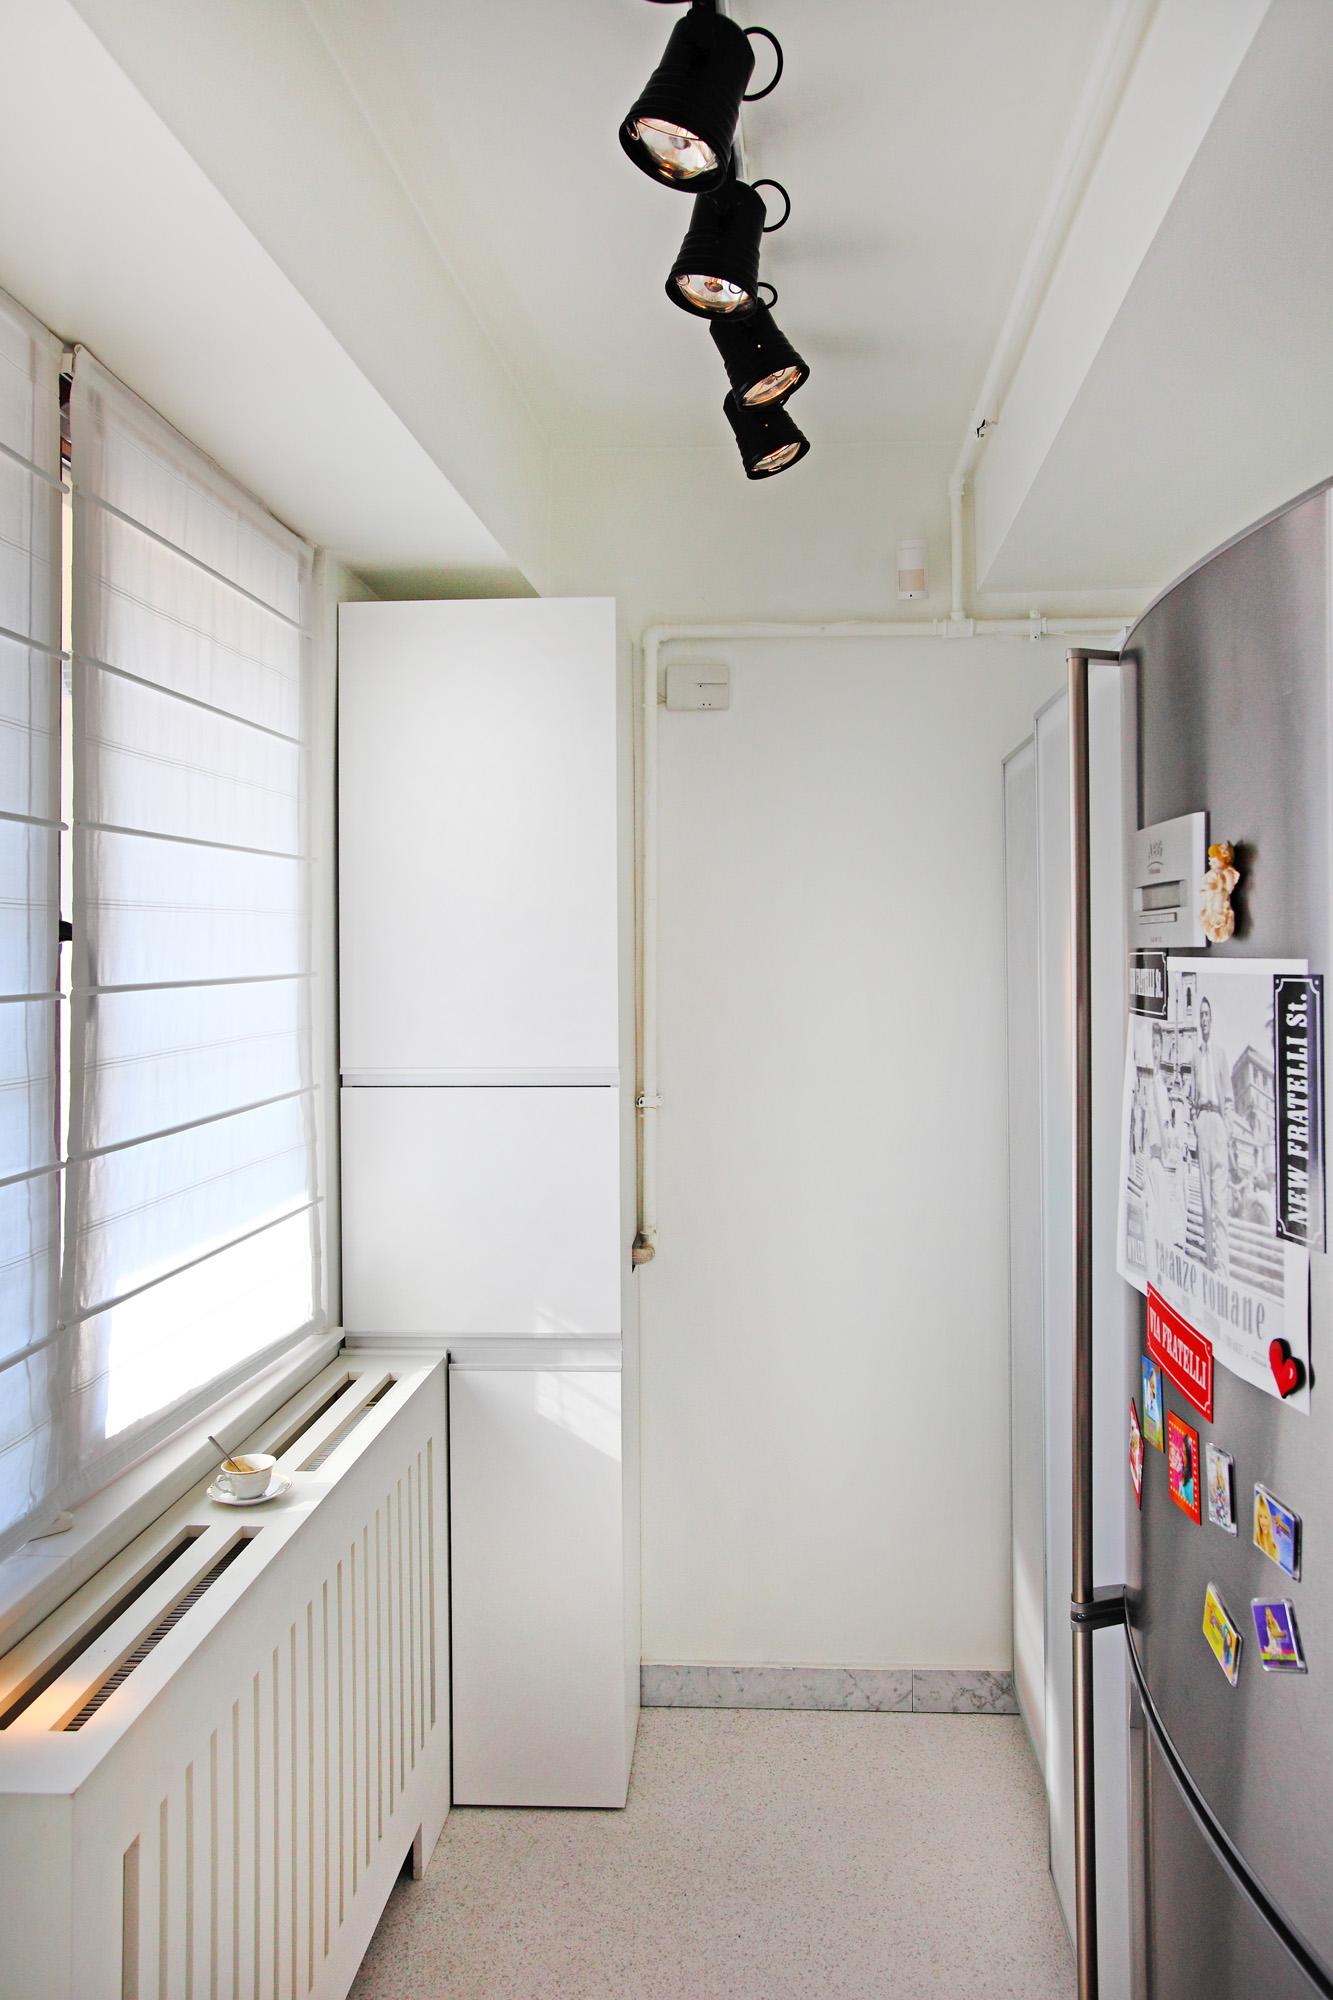 https://ahe-ro.s3.amazonaws.com/12336/apartament-elegant-cu-4-camere-si-terase-generoase-in-centrul-bucurestiului-%287%29.jpg